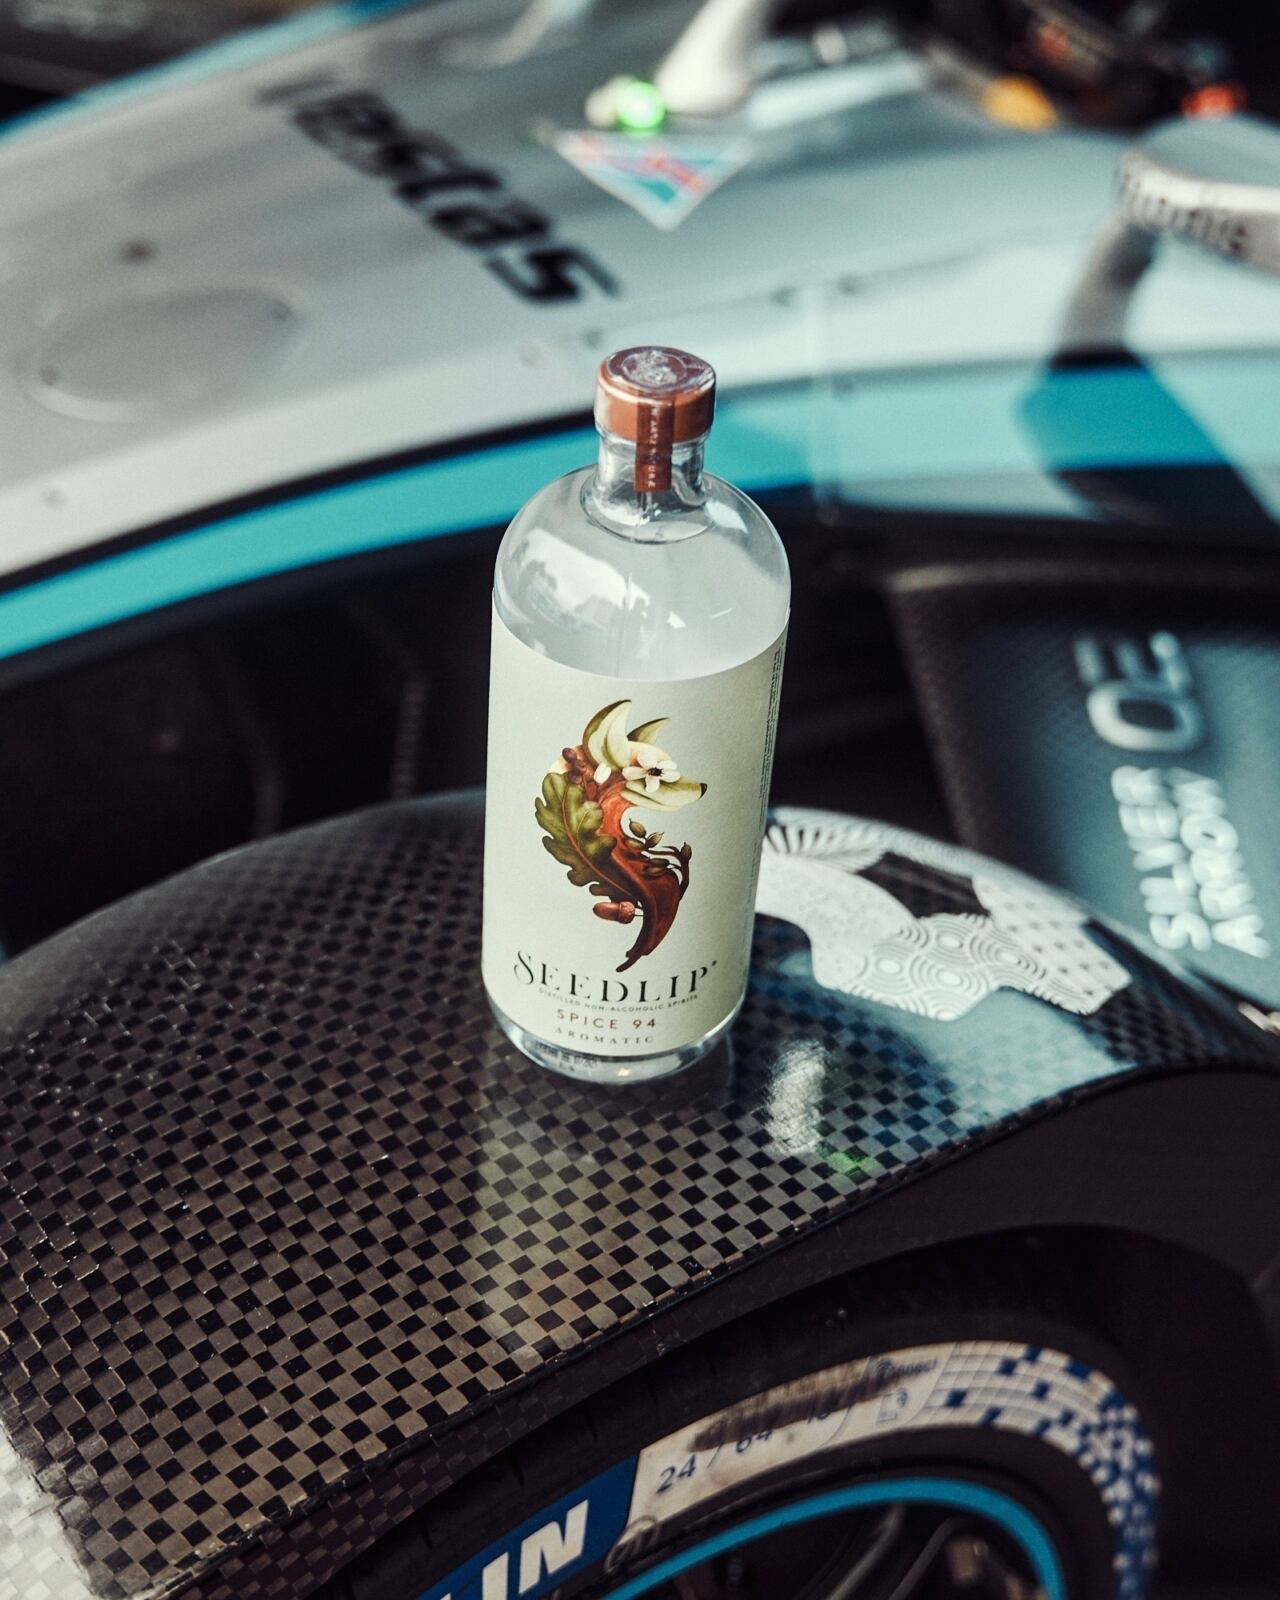 Mercedes-EQ Formula E Team partnership Seedlip